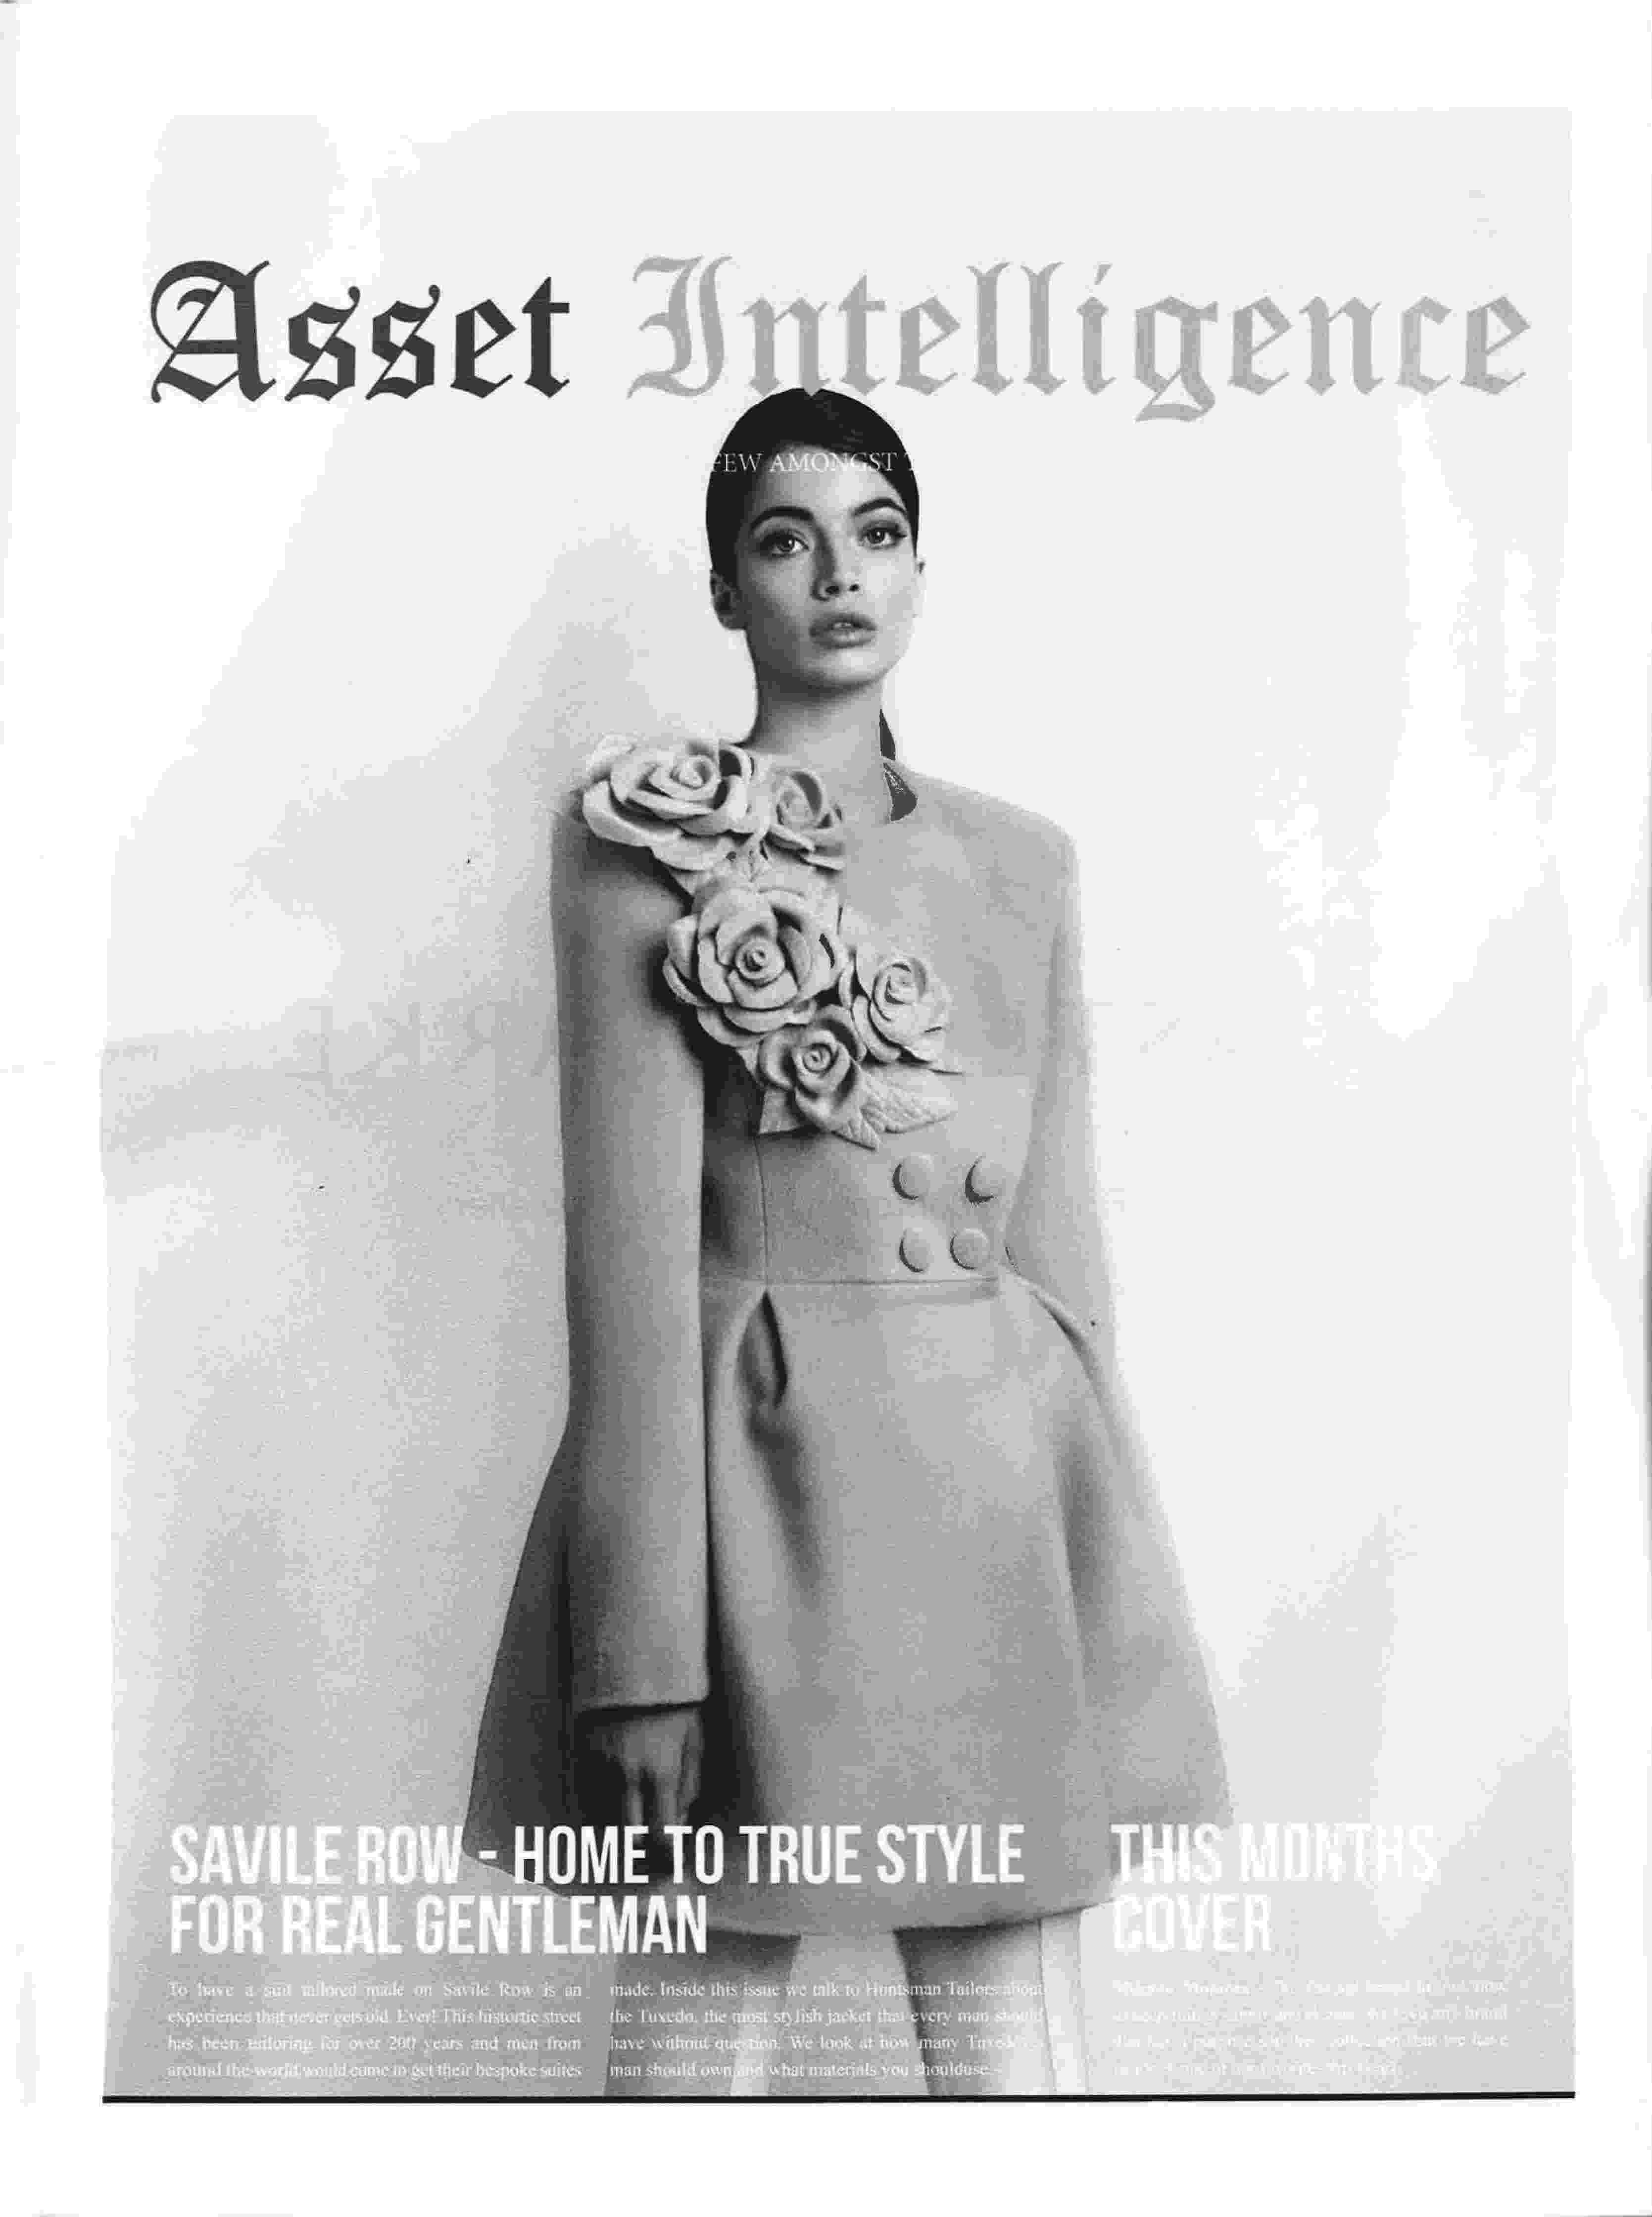 Asset-Intelligence-Essar-1.jpg